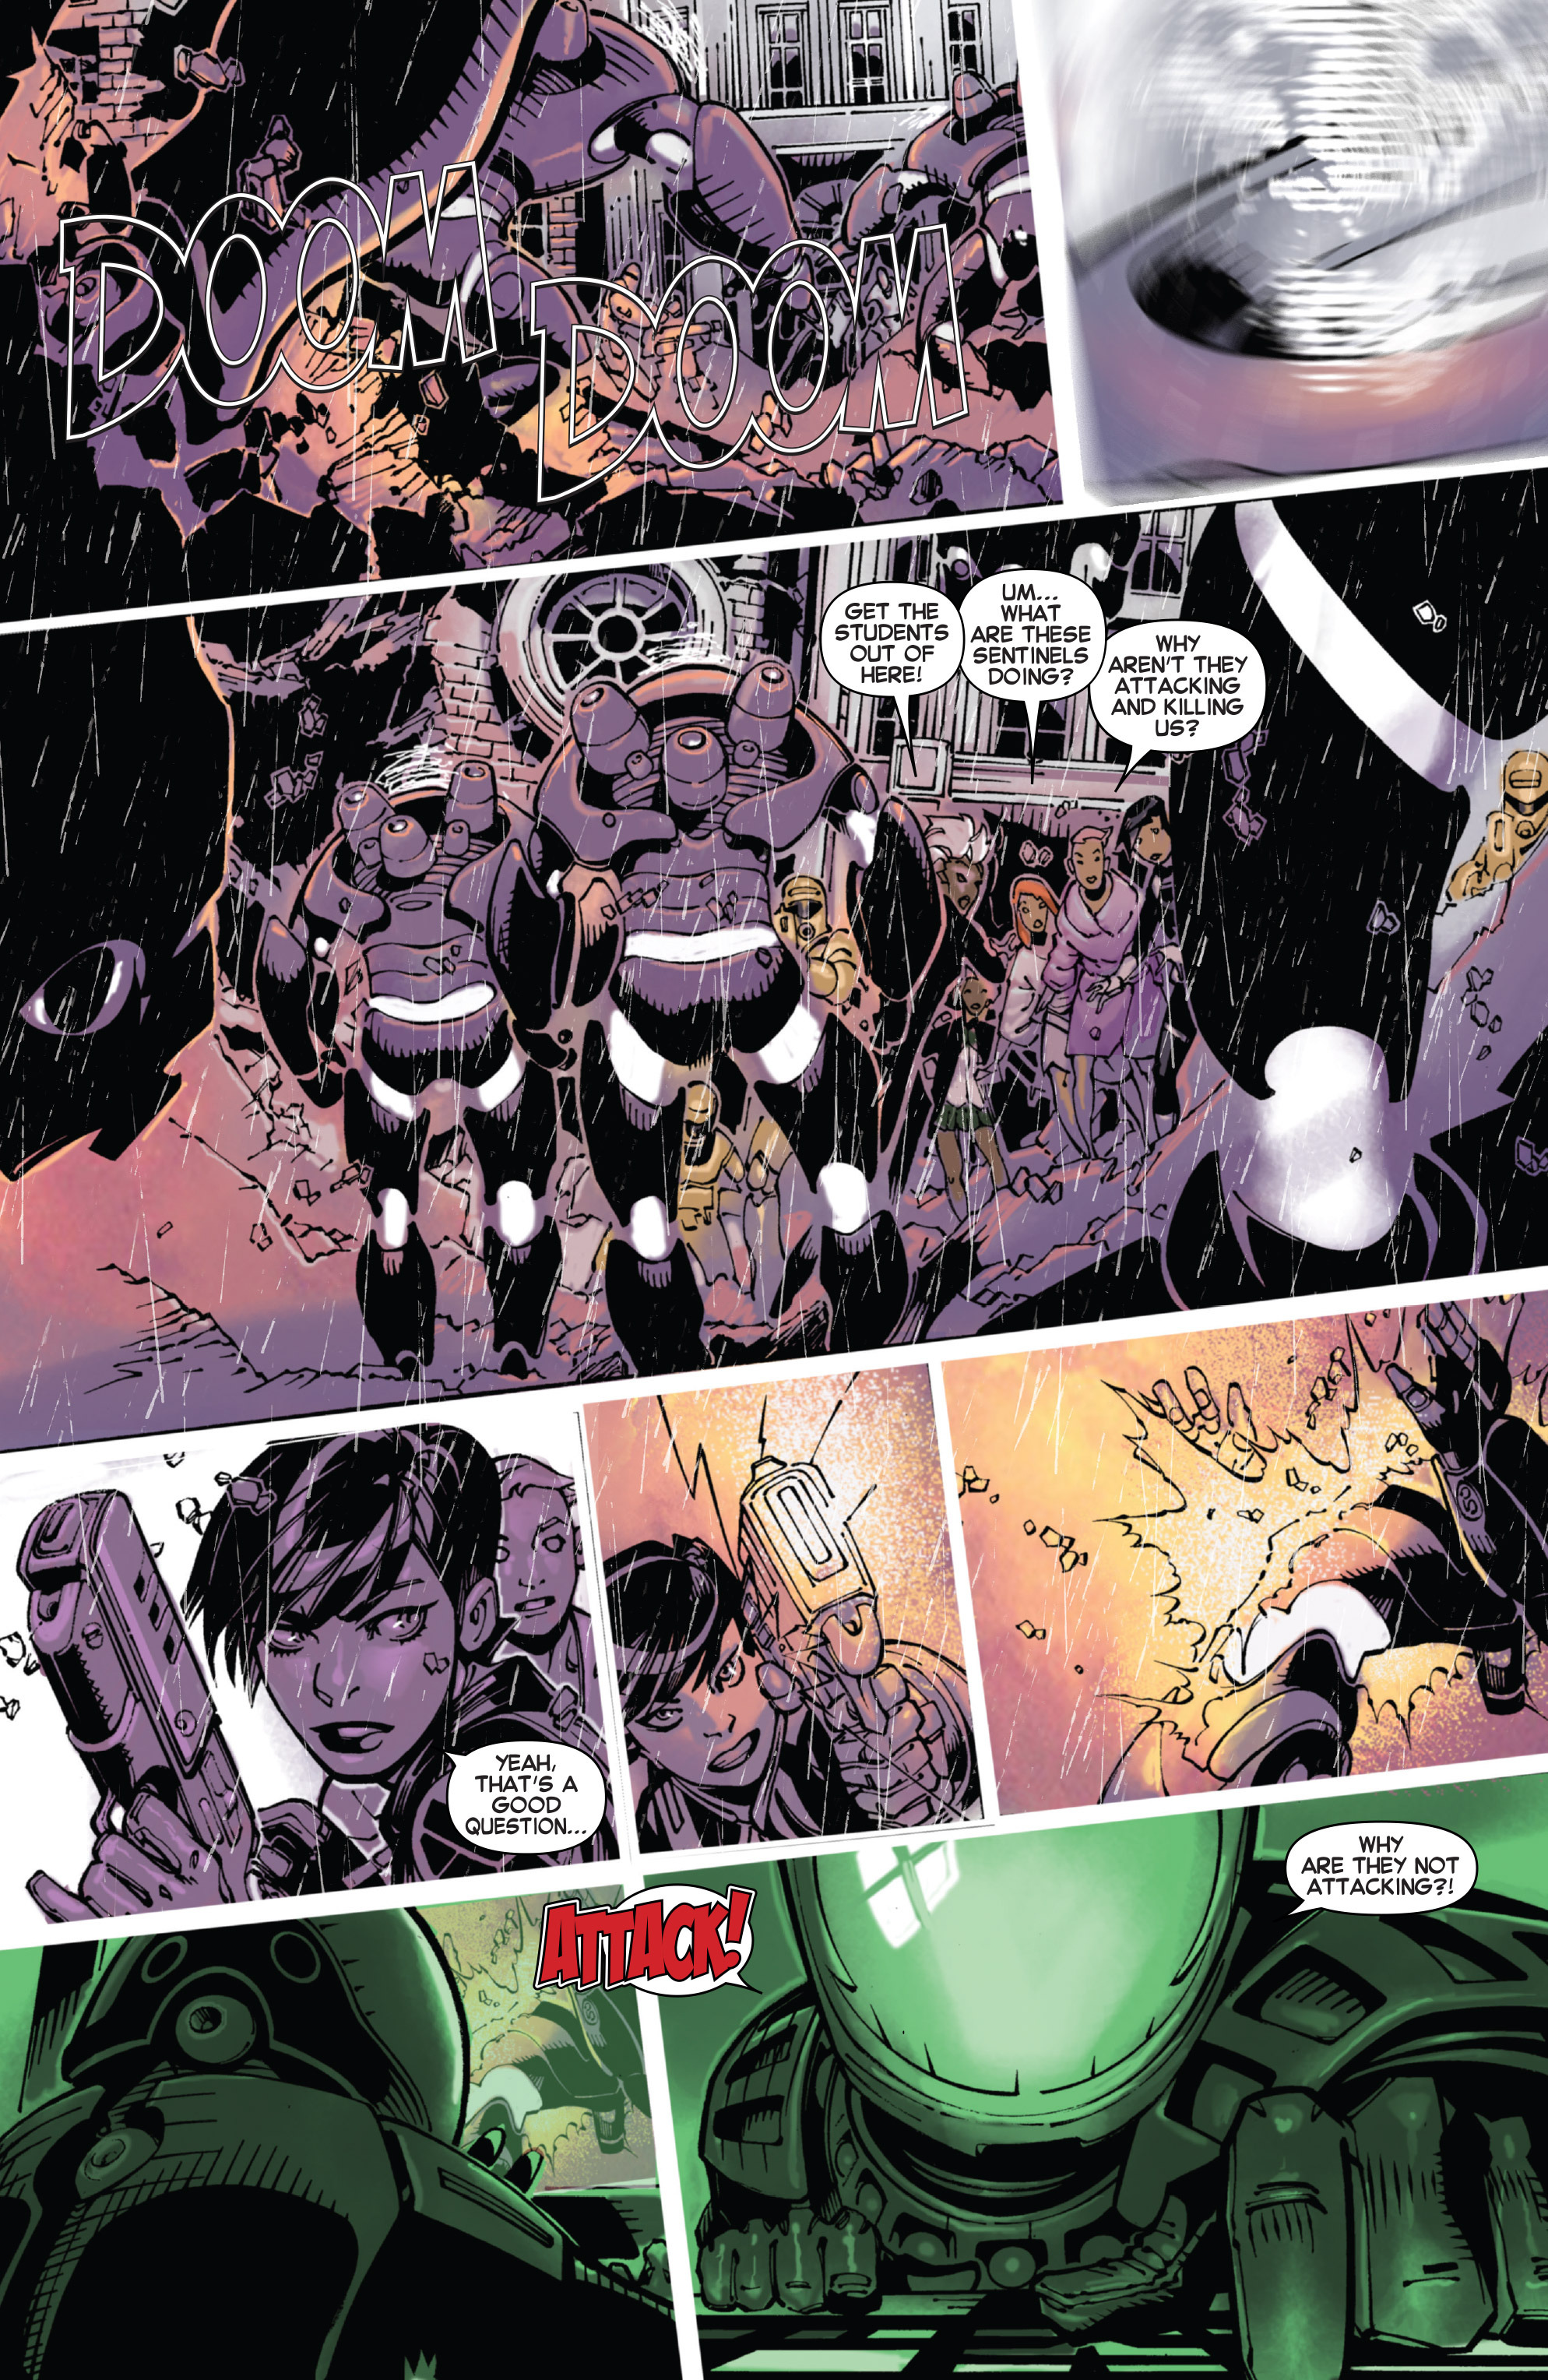 Read online Uncanny X-Men (2013) comic -  Issue # _TPB 4 - vs. S.H.I.E.L.D - 70